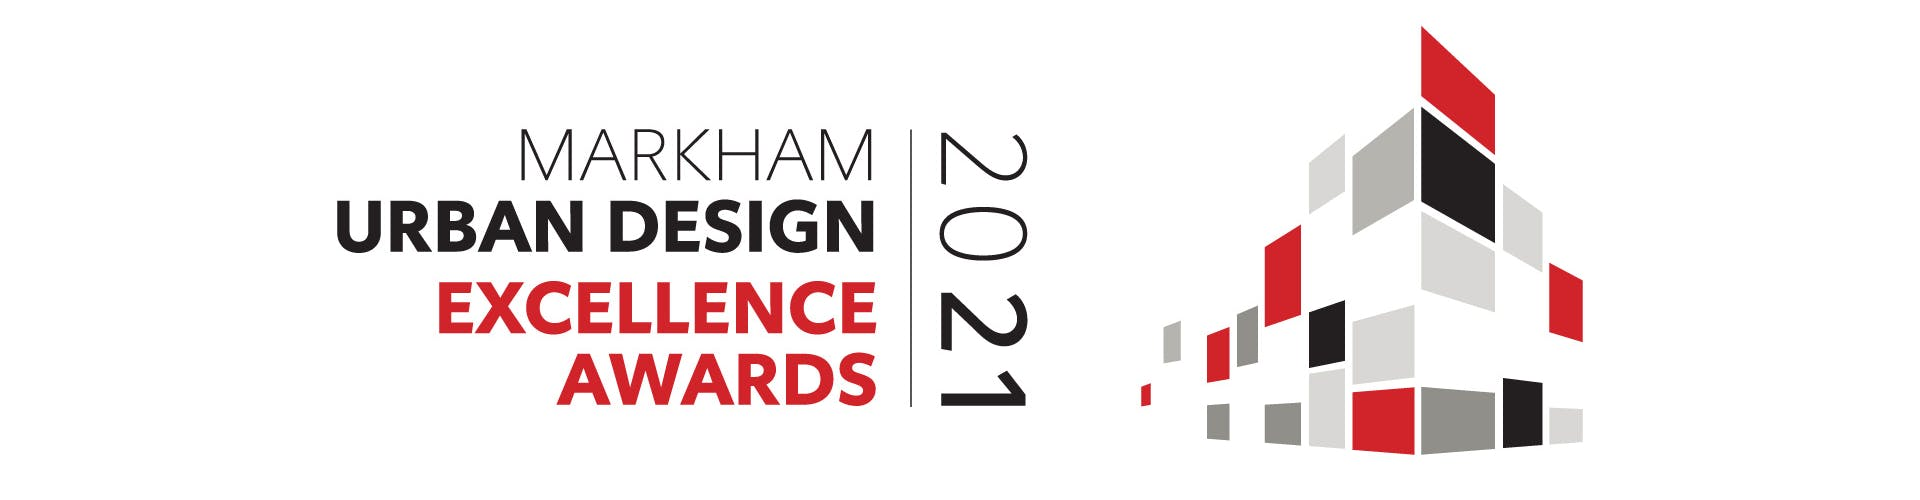 Markham Urban Design Excellence Awards 2021